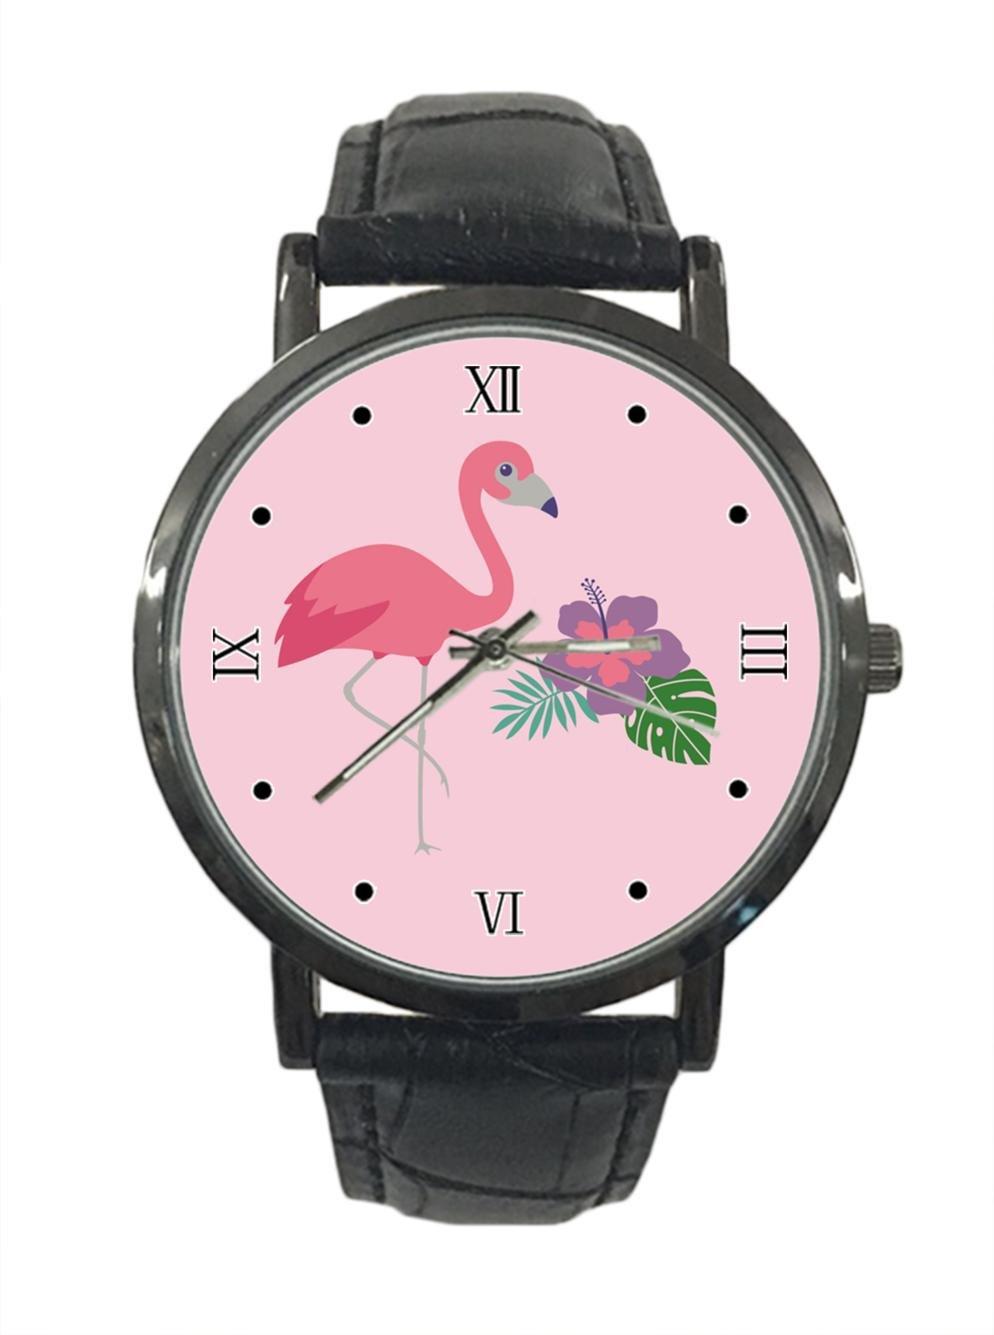 jkfgweeryhrt New Simple Fashion Flamingo Stainless Steel Leather Analog Quartz Sport Wrist Watch